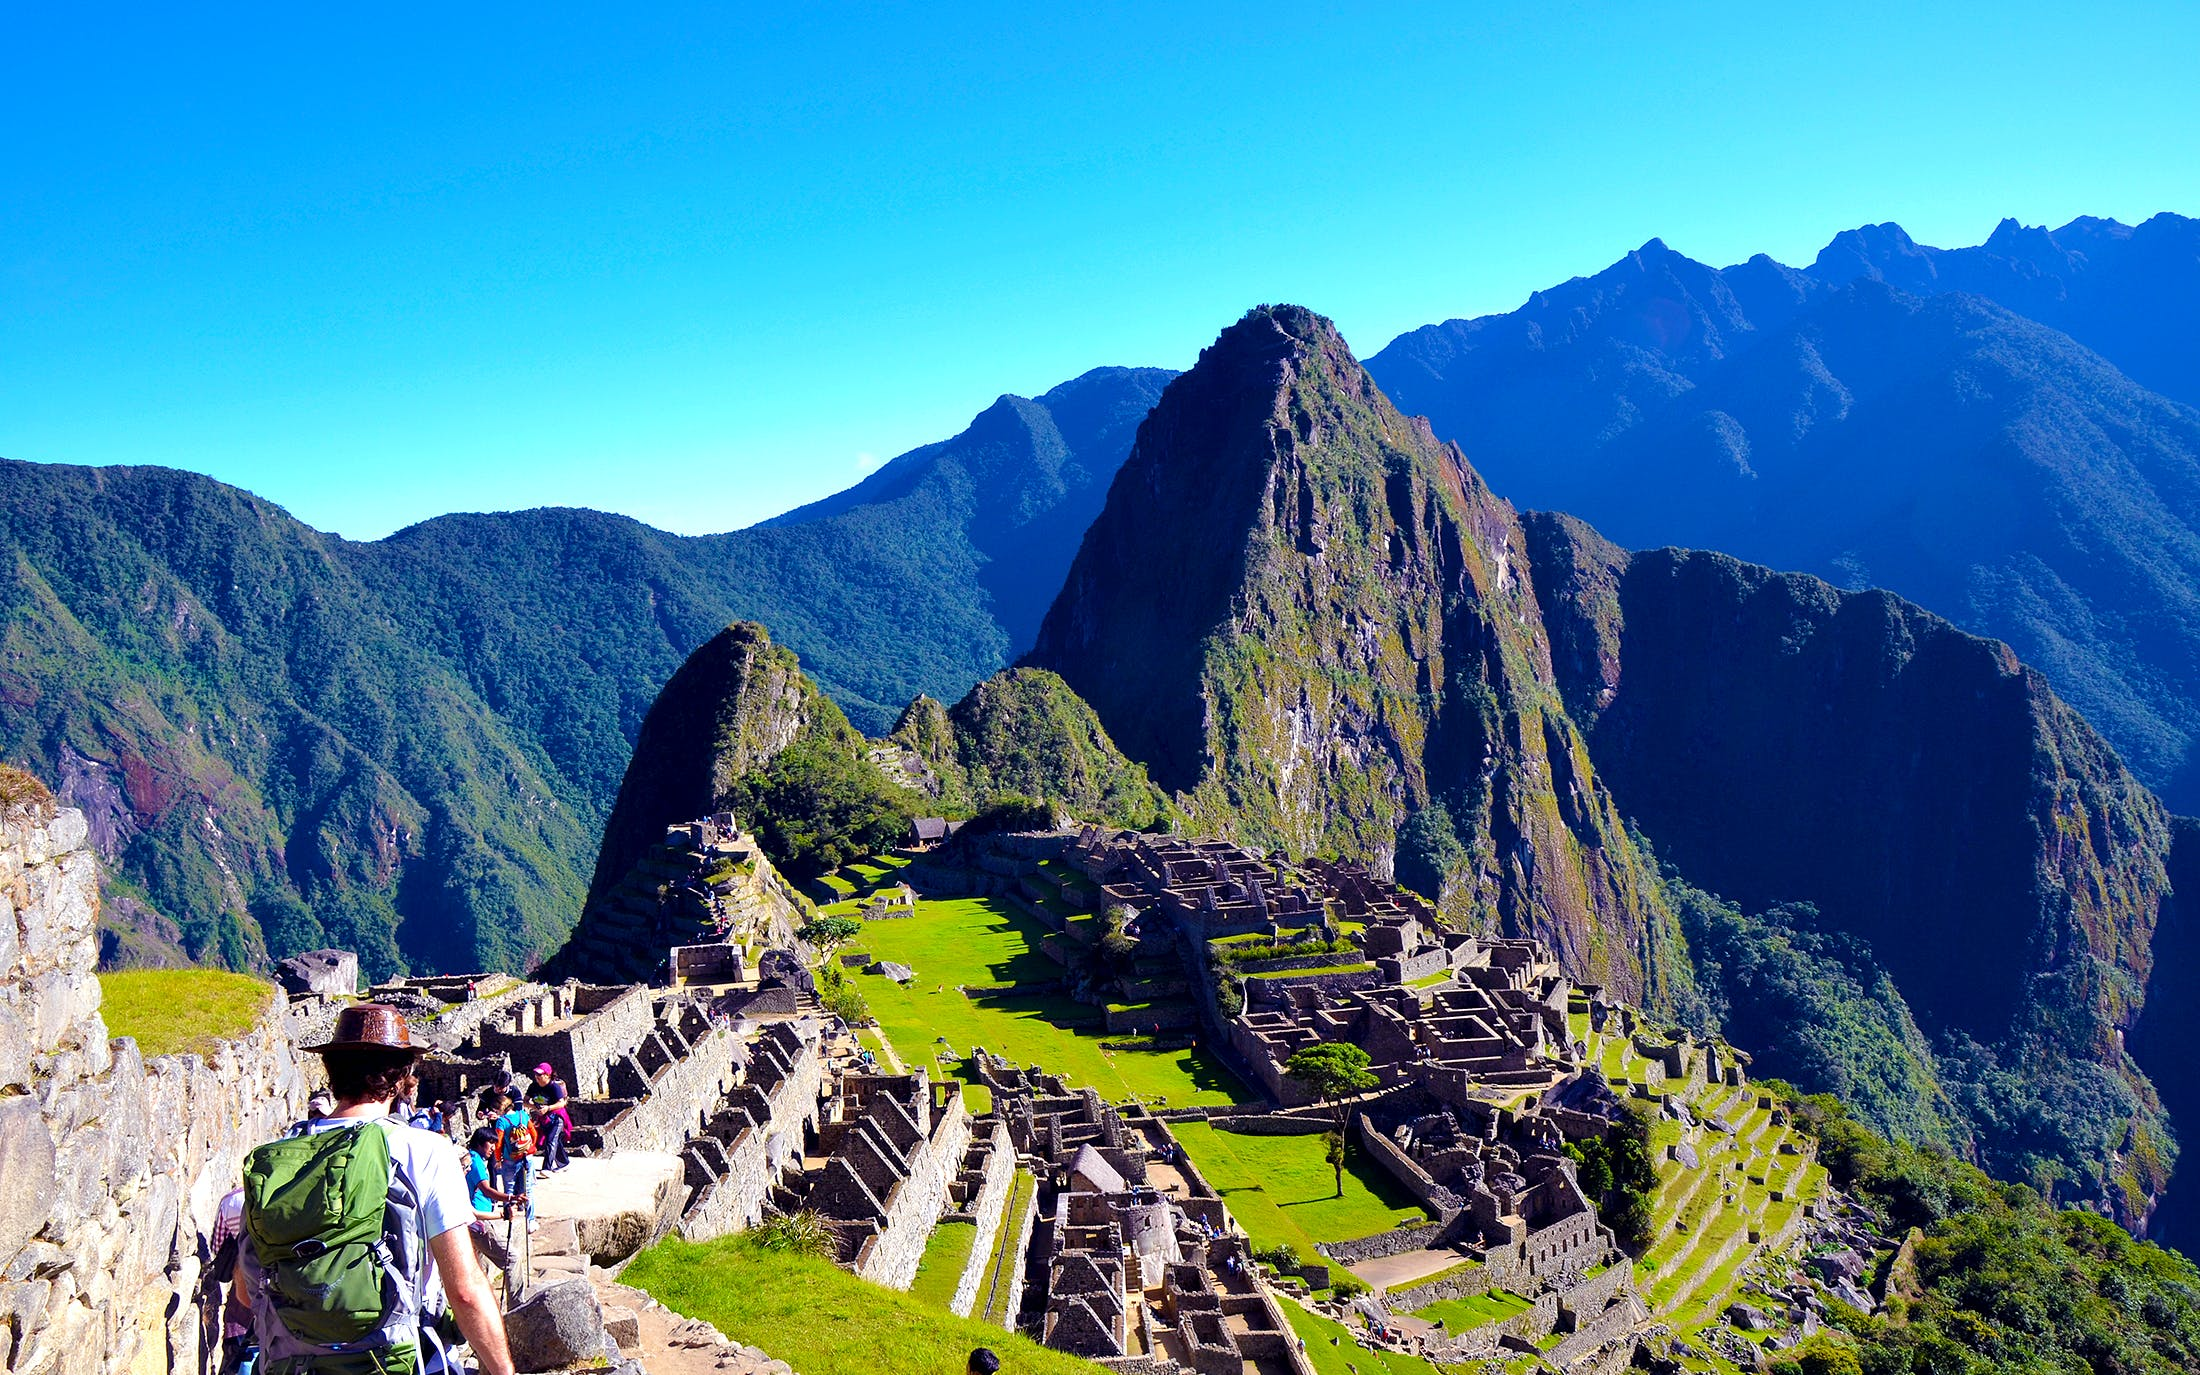 10-Day Salkantay & Inca Trail to Machu Picchu